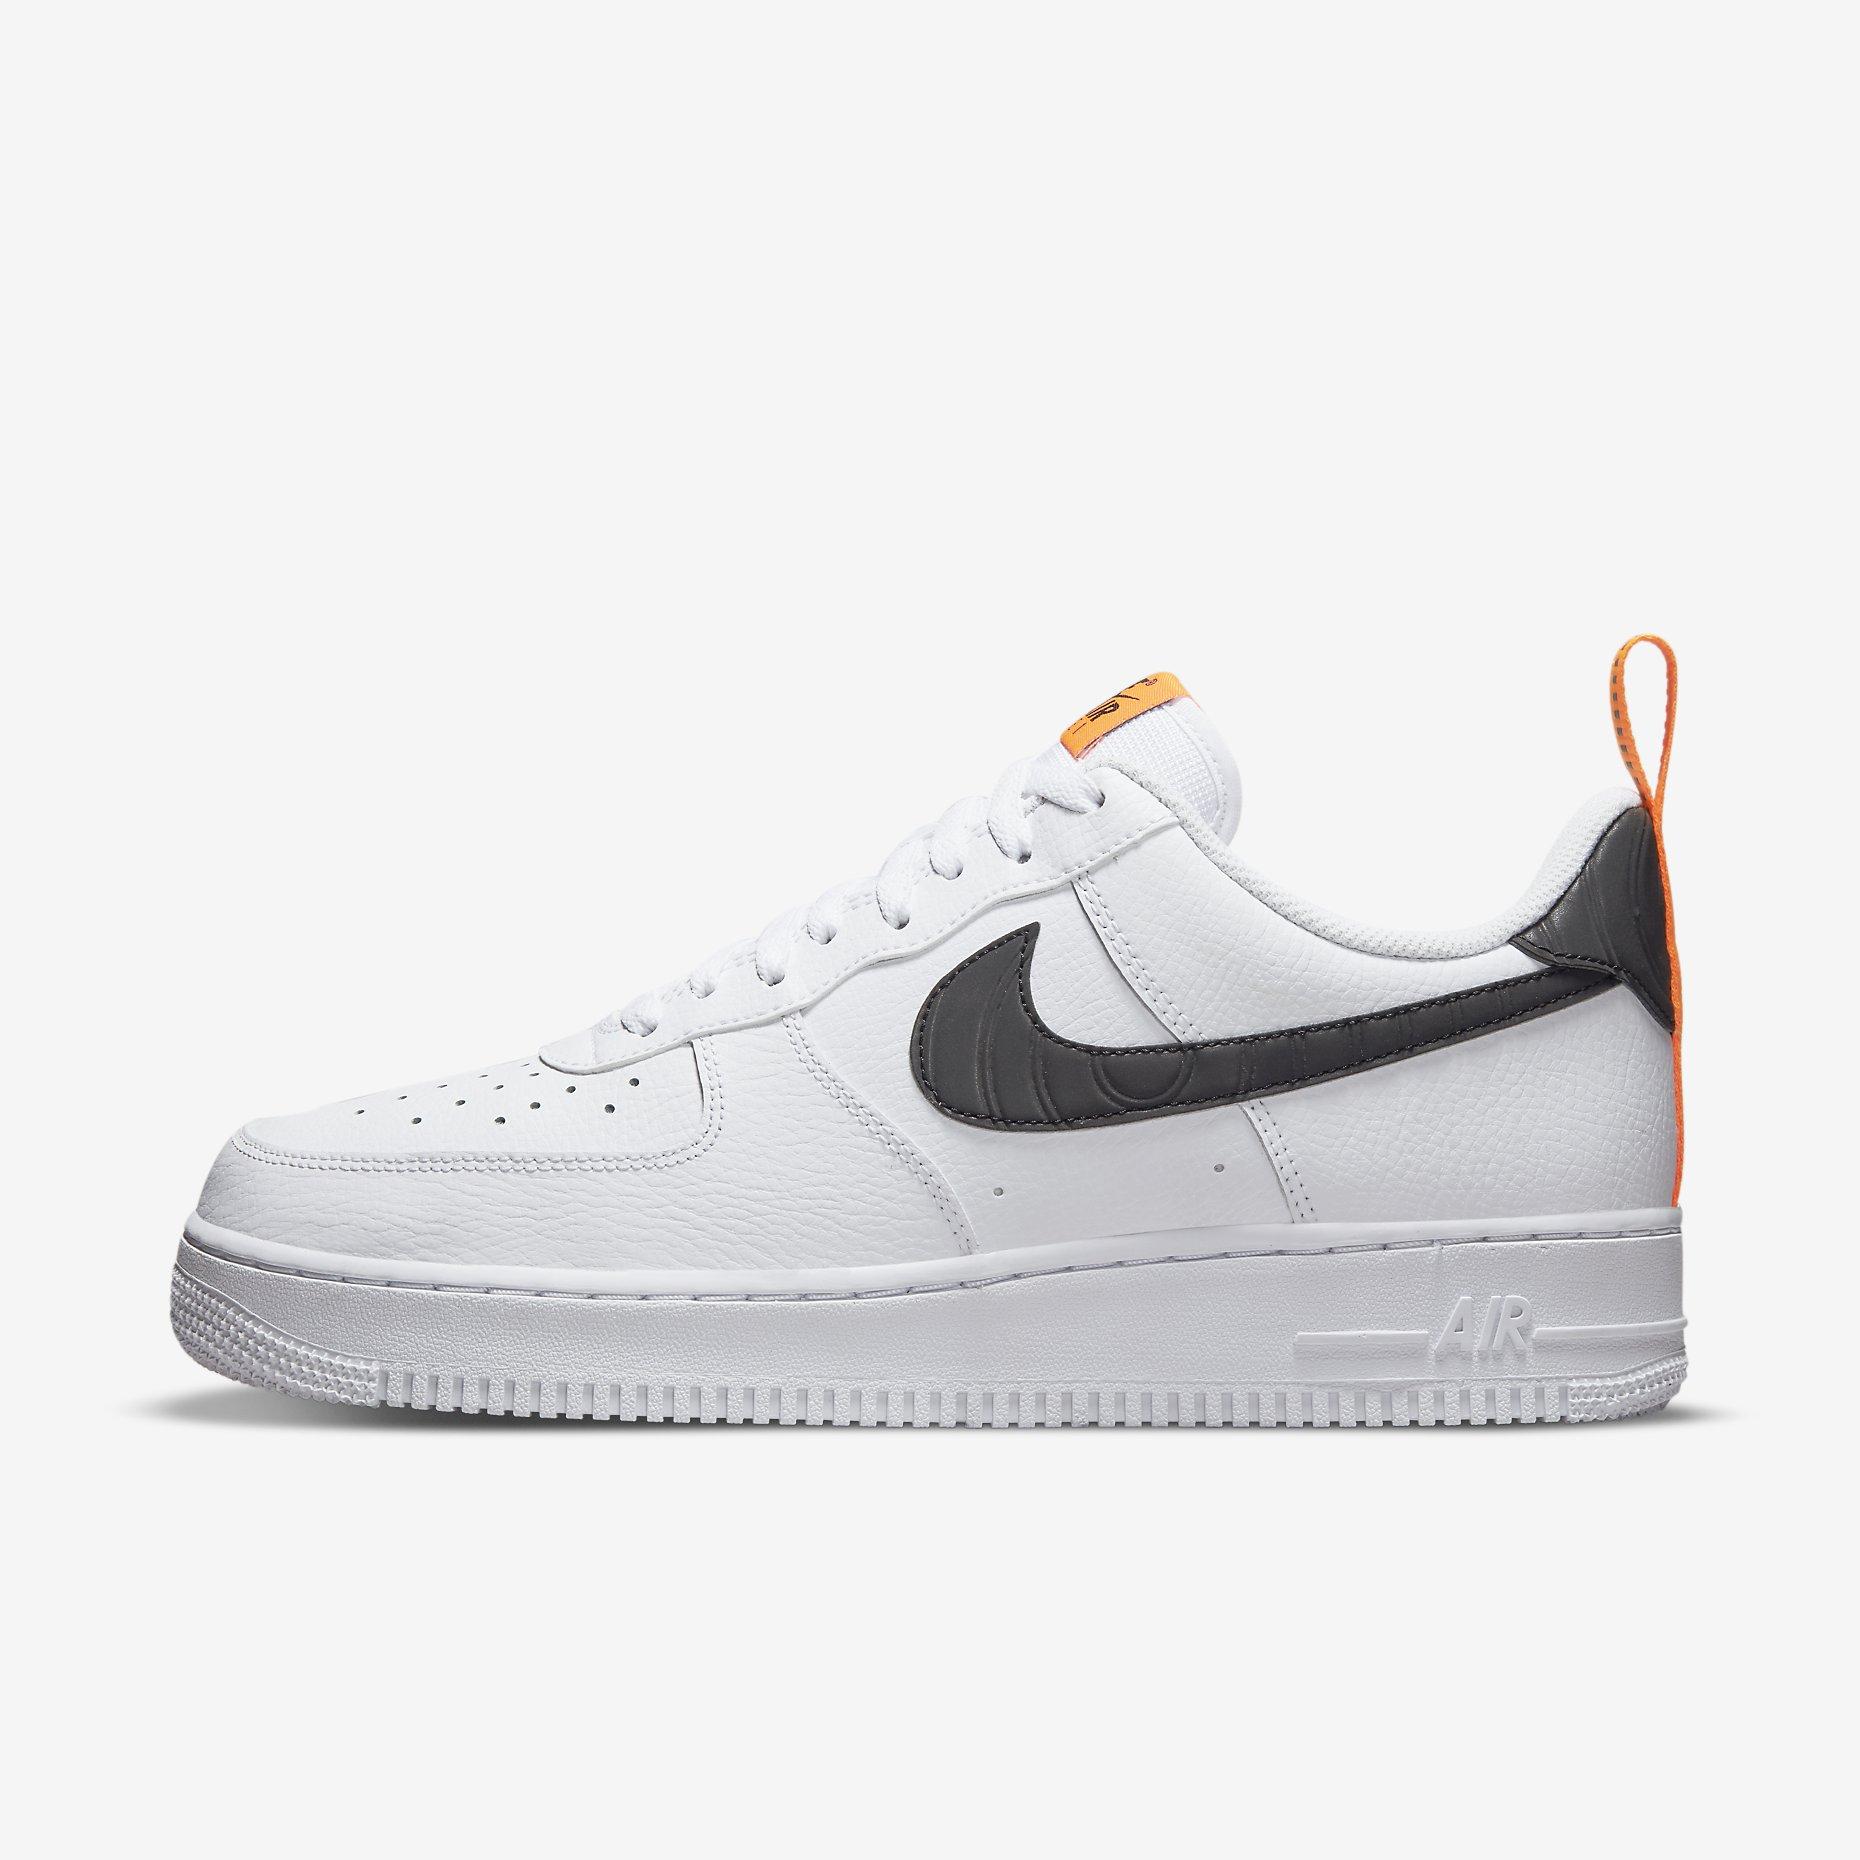 Nike Air Force 1 Low 'White' - 'Pivot Point'